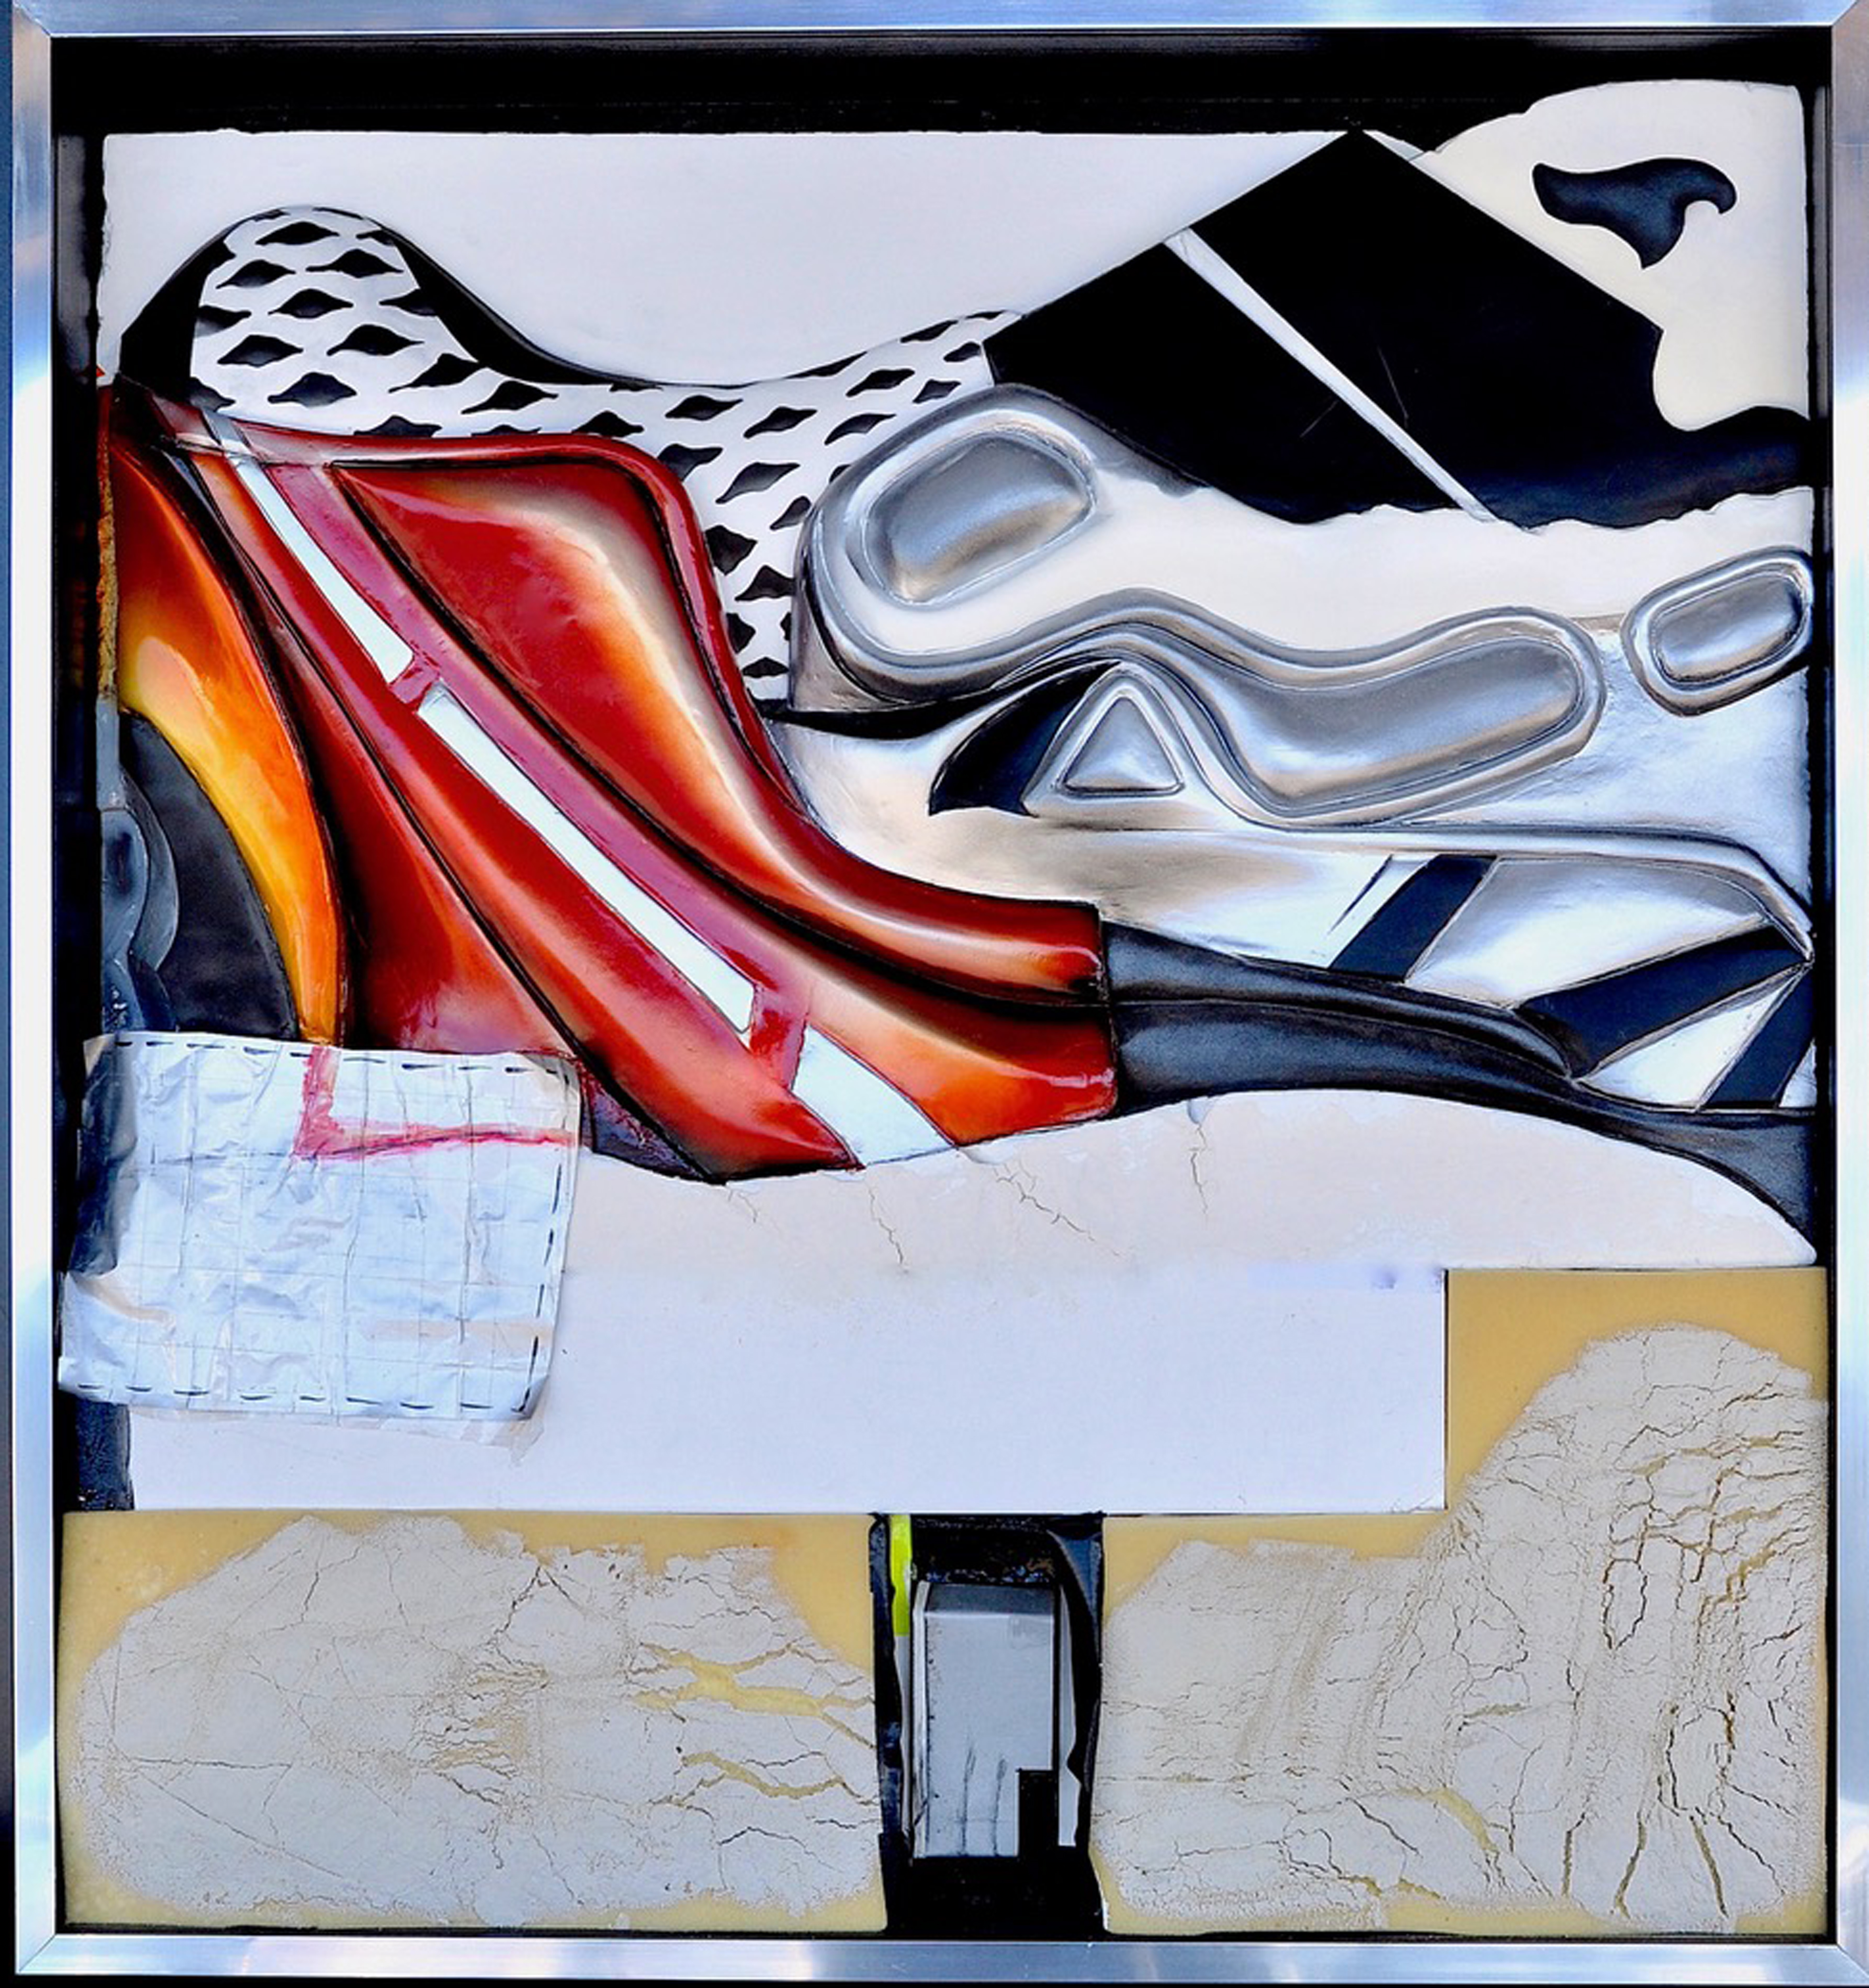 Galerie Barbara Thumm \ New Viewings #23 \ New Viewings #23